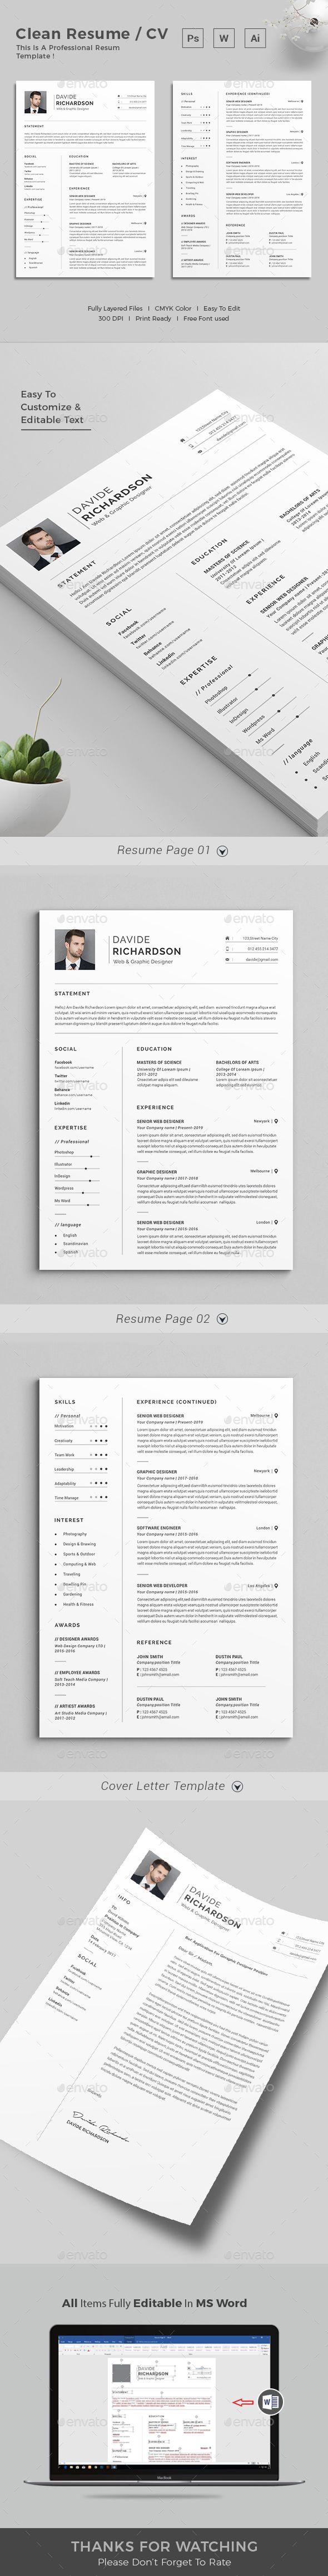 5340 best RESUME | CV | LEBENSLAUF images on Pinterest | Resume ...